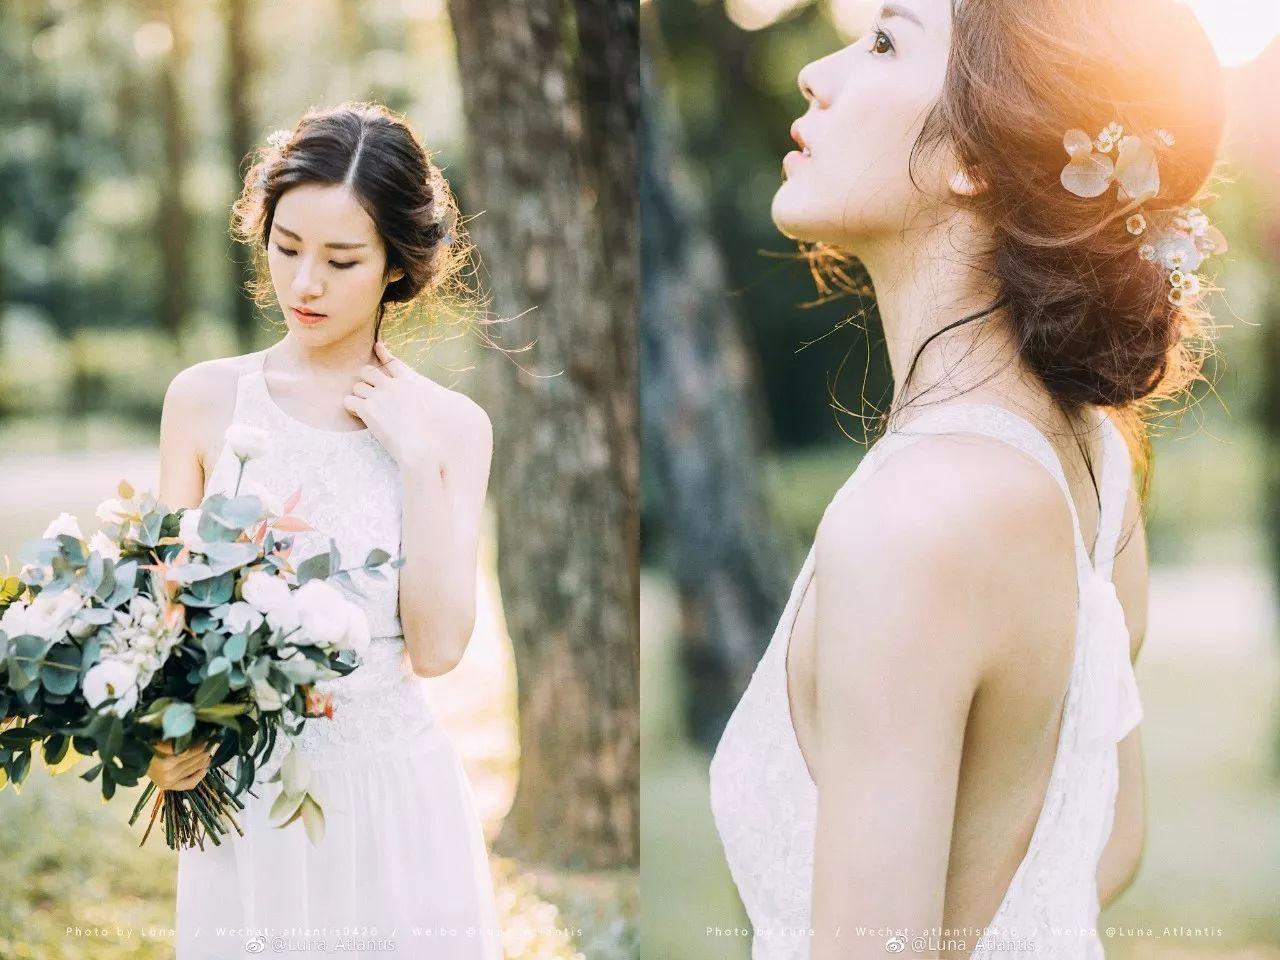 【S774】Luna_Atlantis婚纱旅拍人像摄影课程花间学院教程摄影后期修图教程